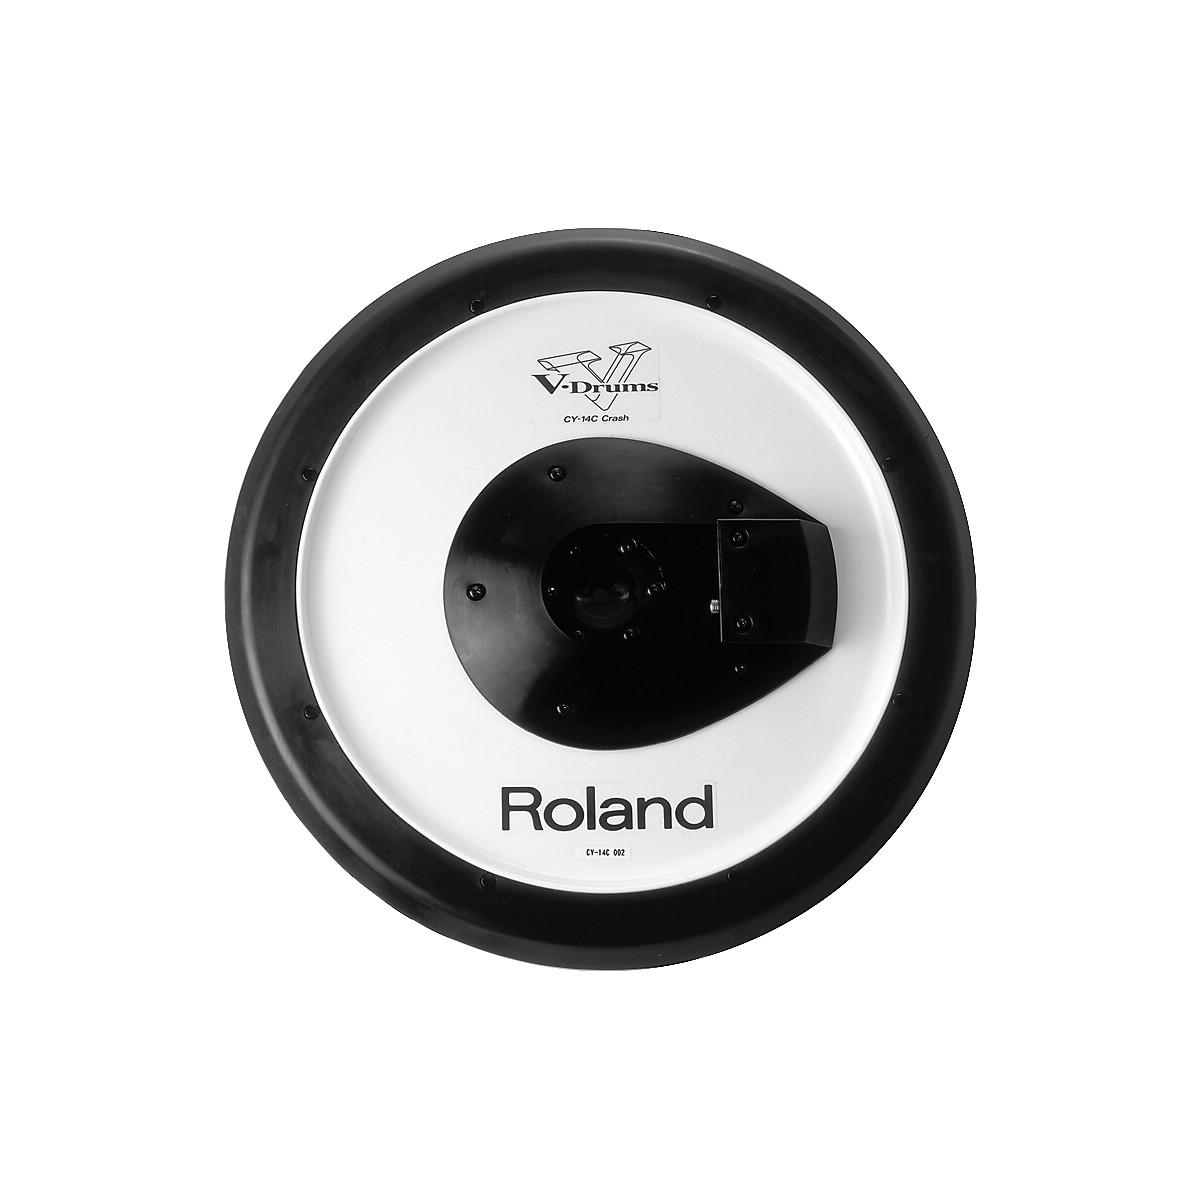 Roland CY-14C V-Cymbal Crash